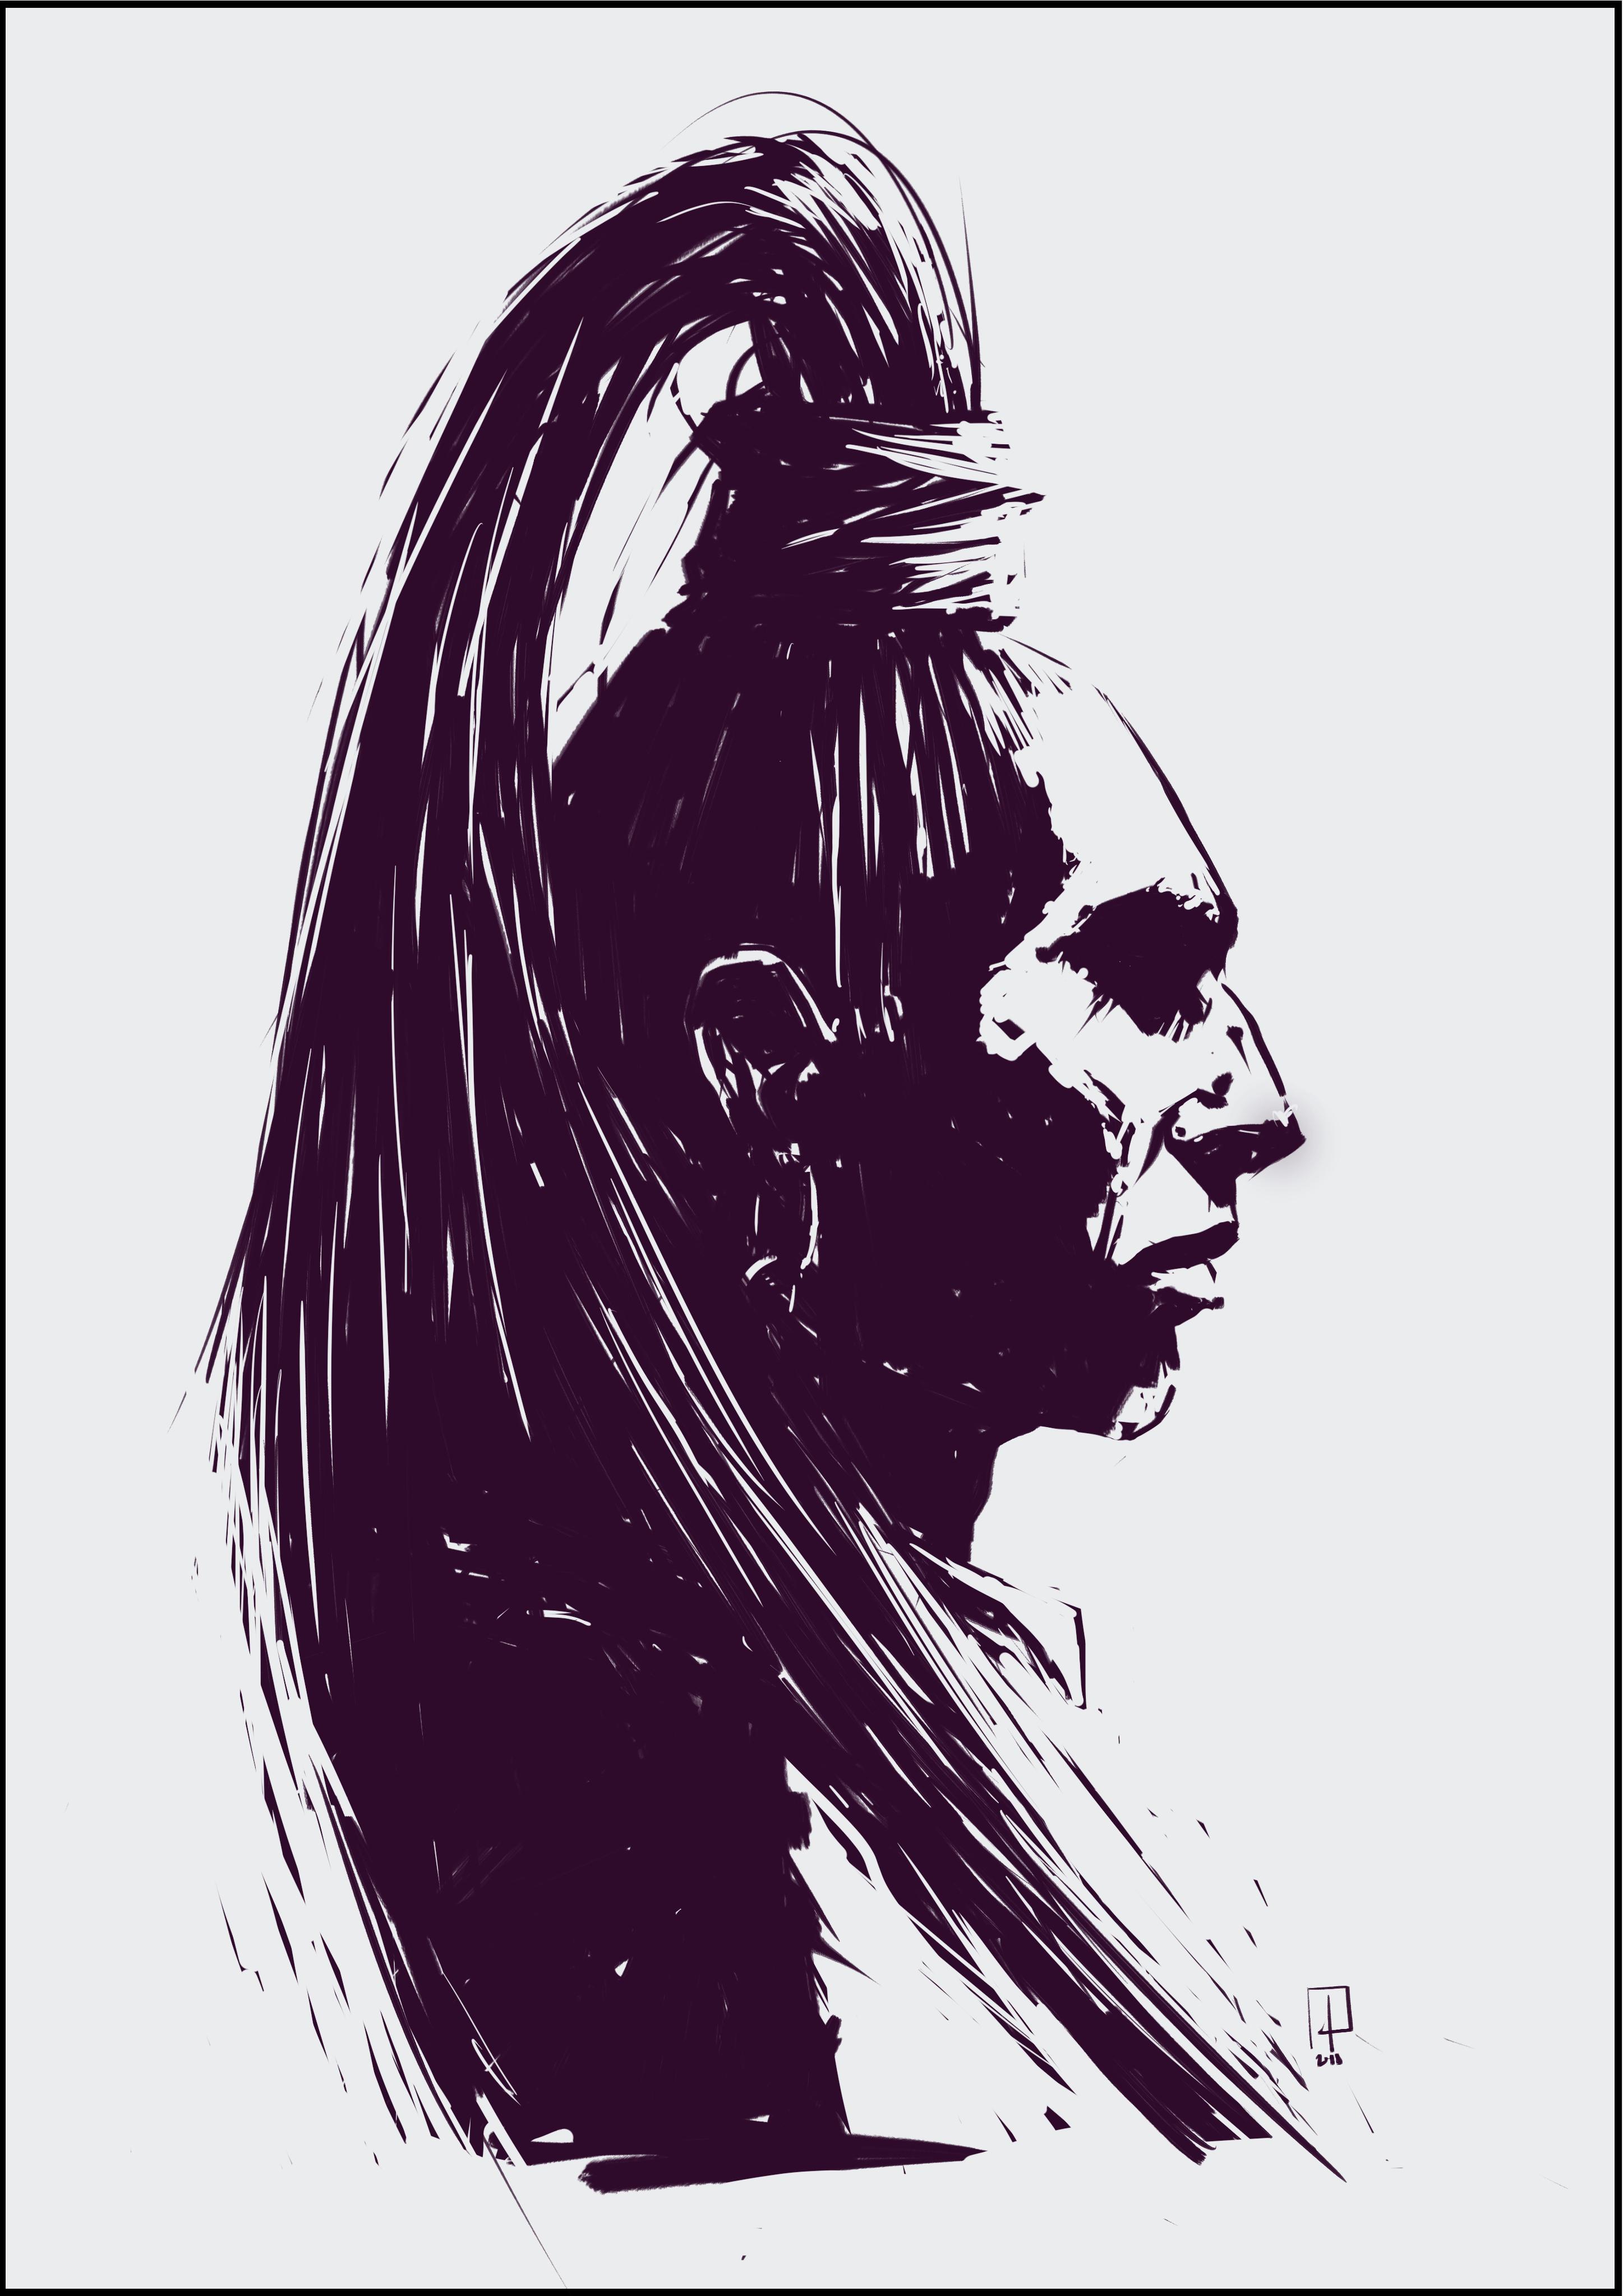 _Native_